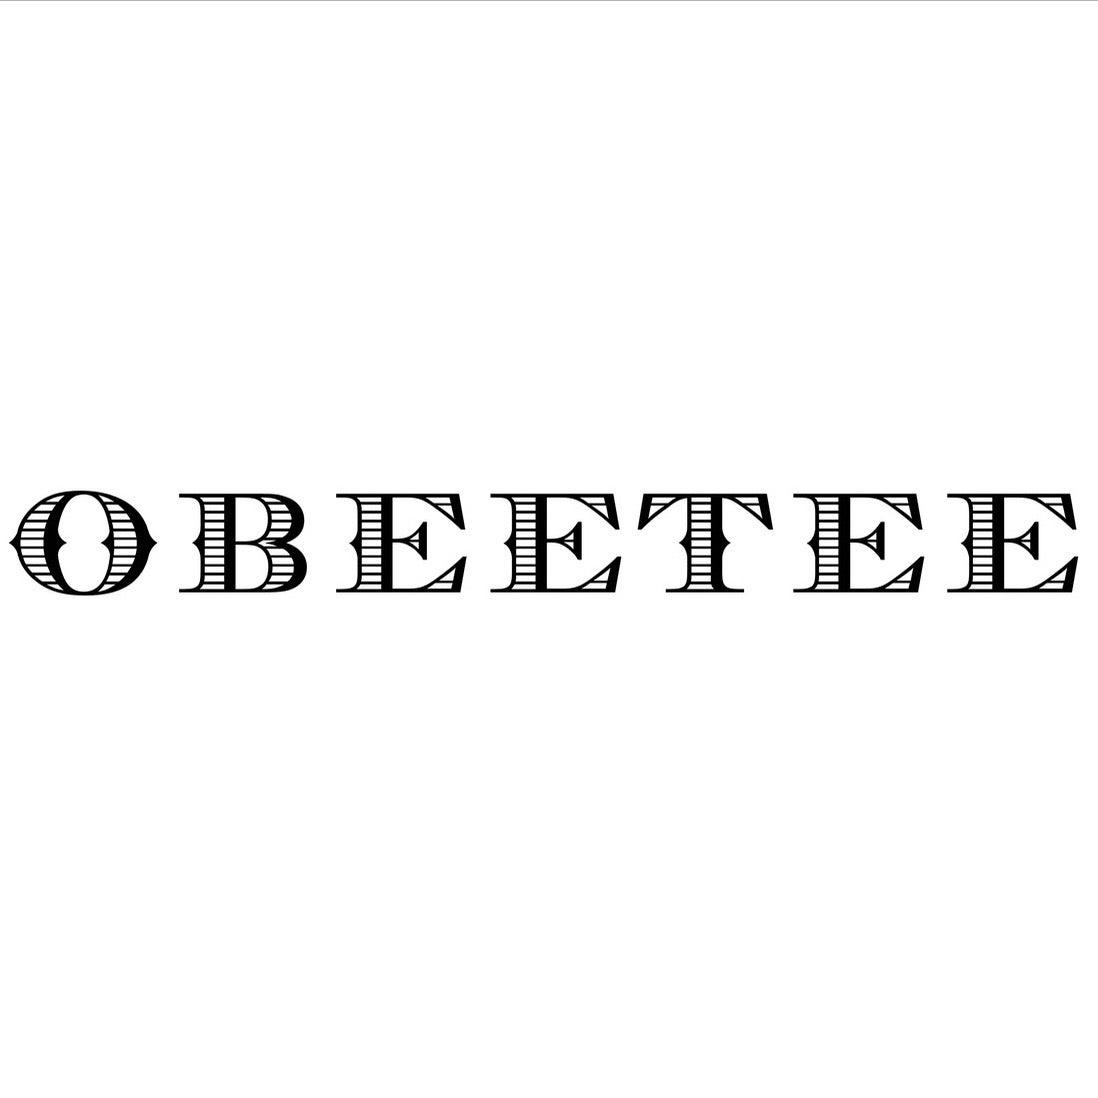 Obeetee